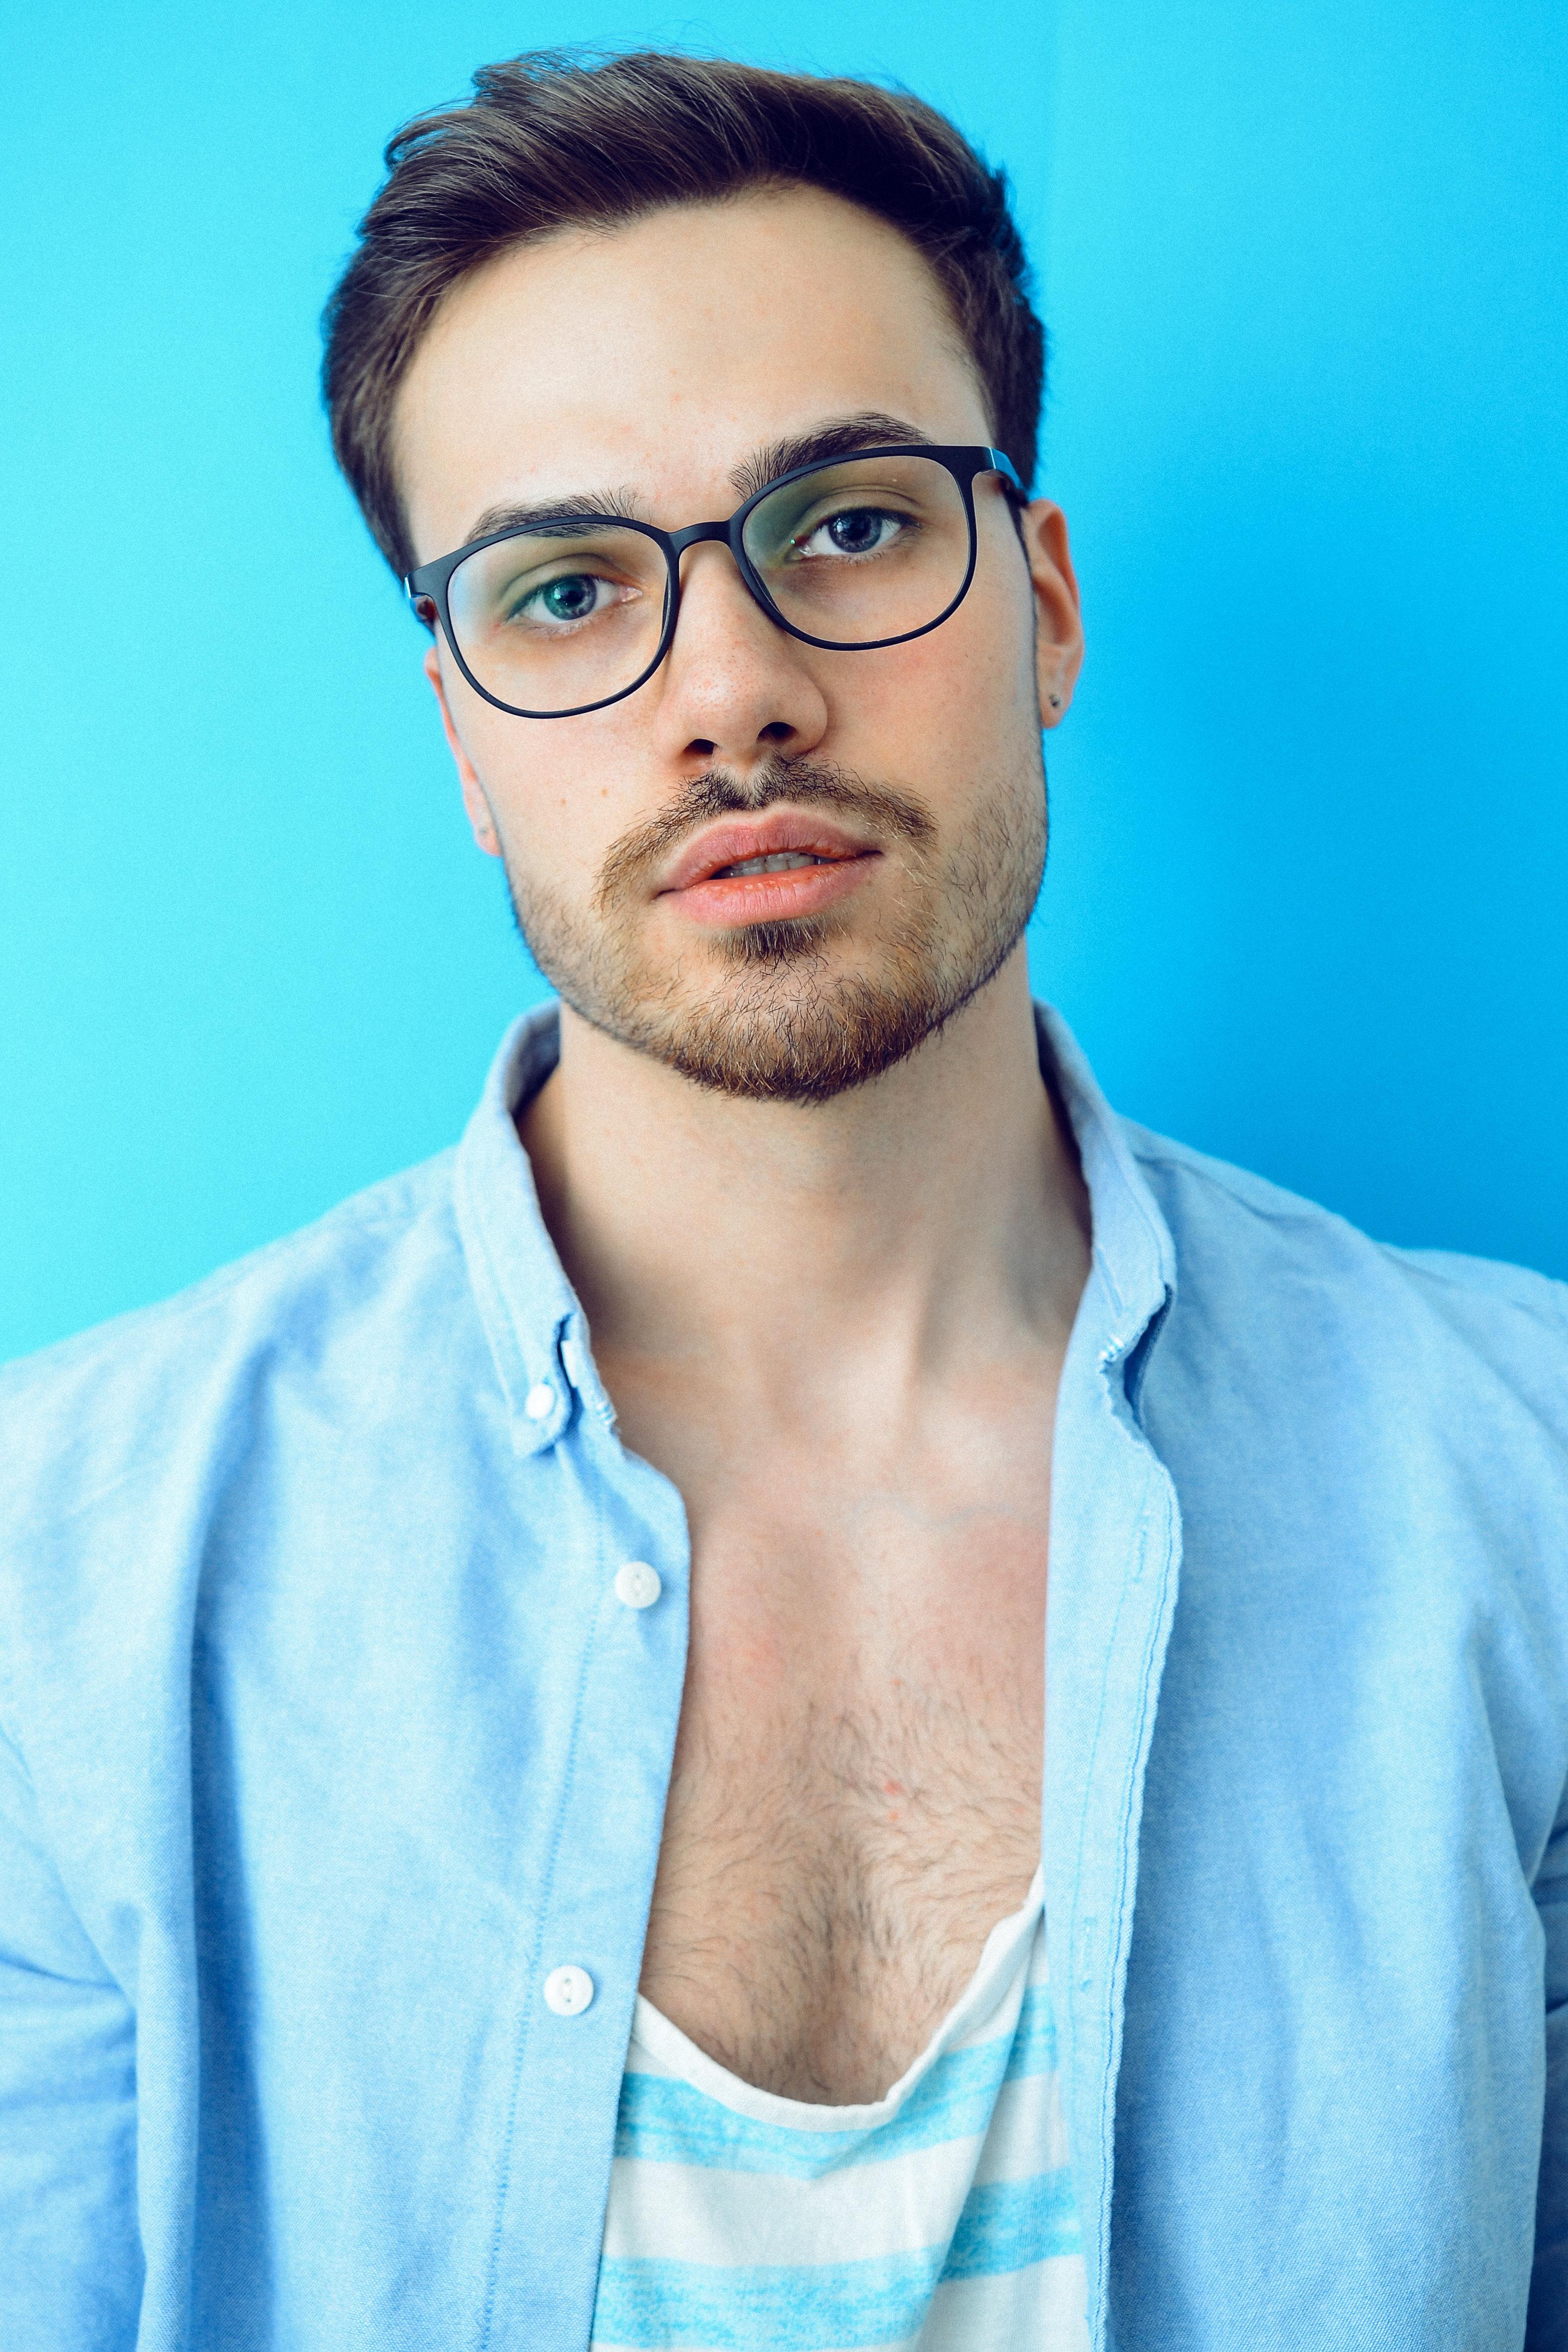 Free Images : blue, casual, eyeglasses, eyewear, face